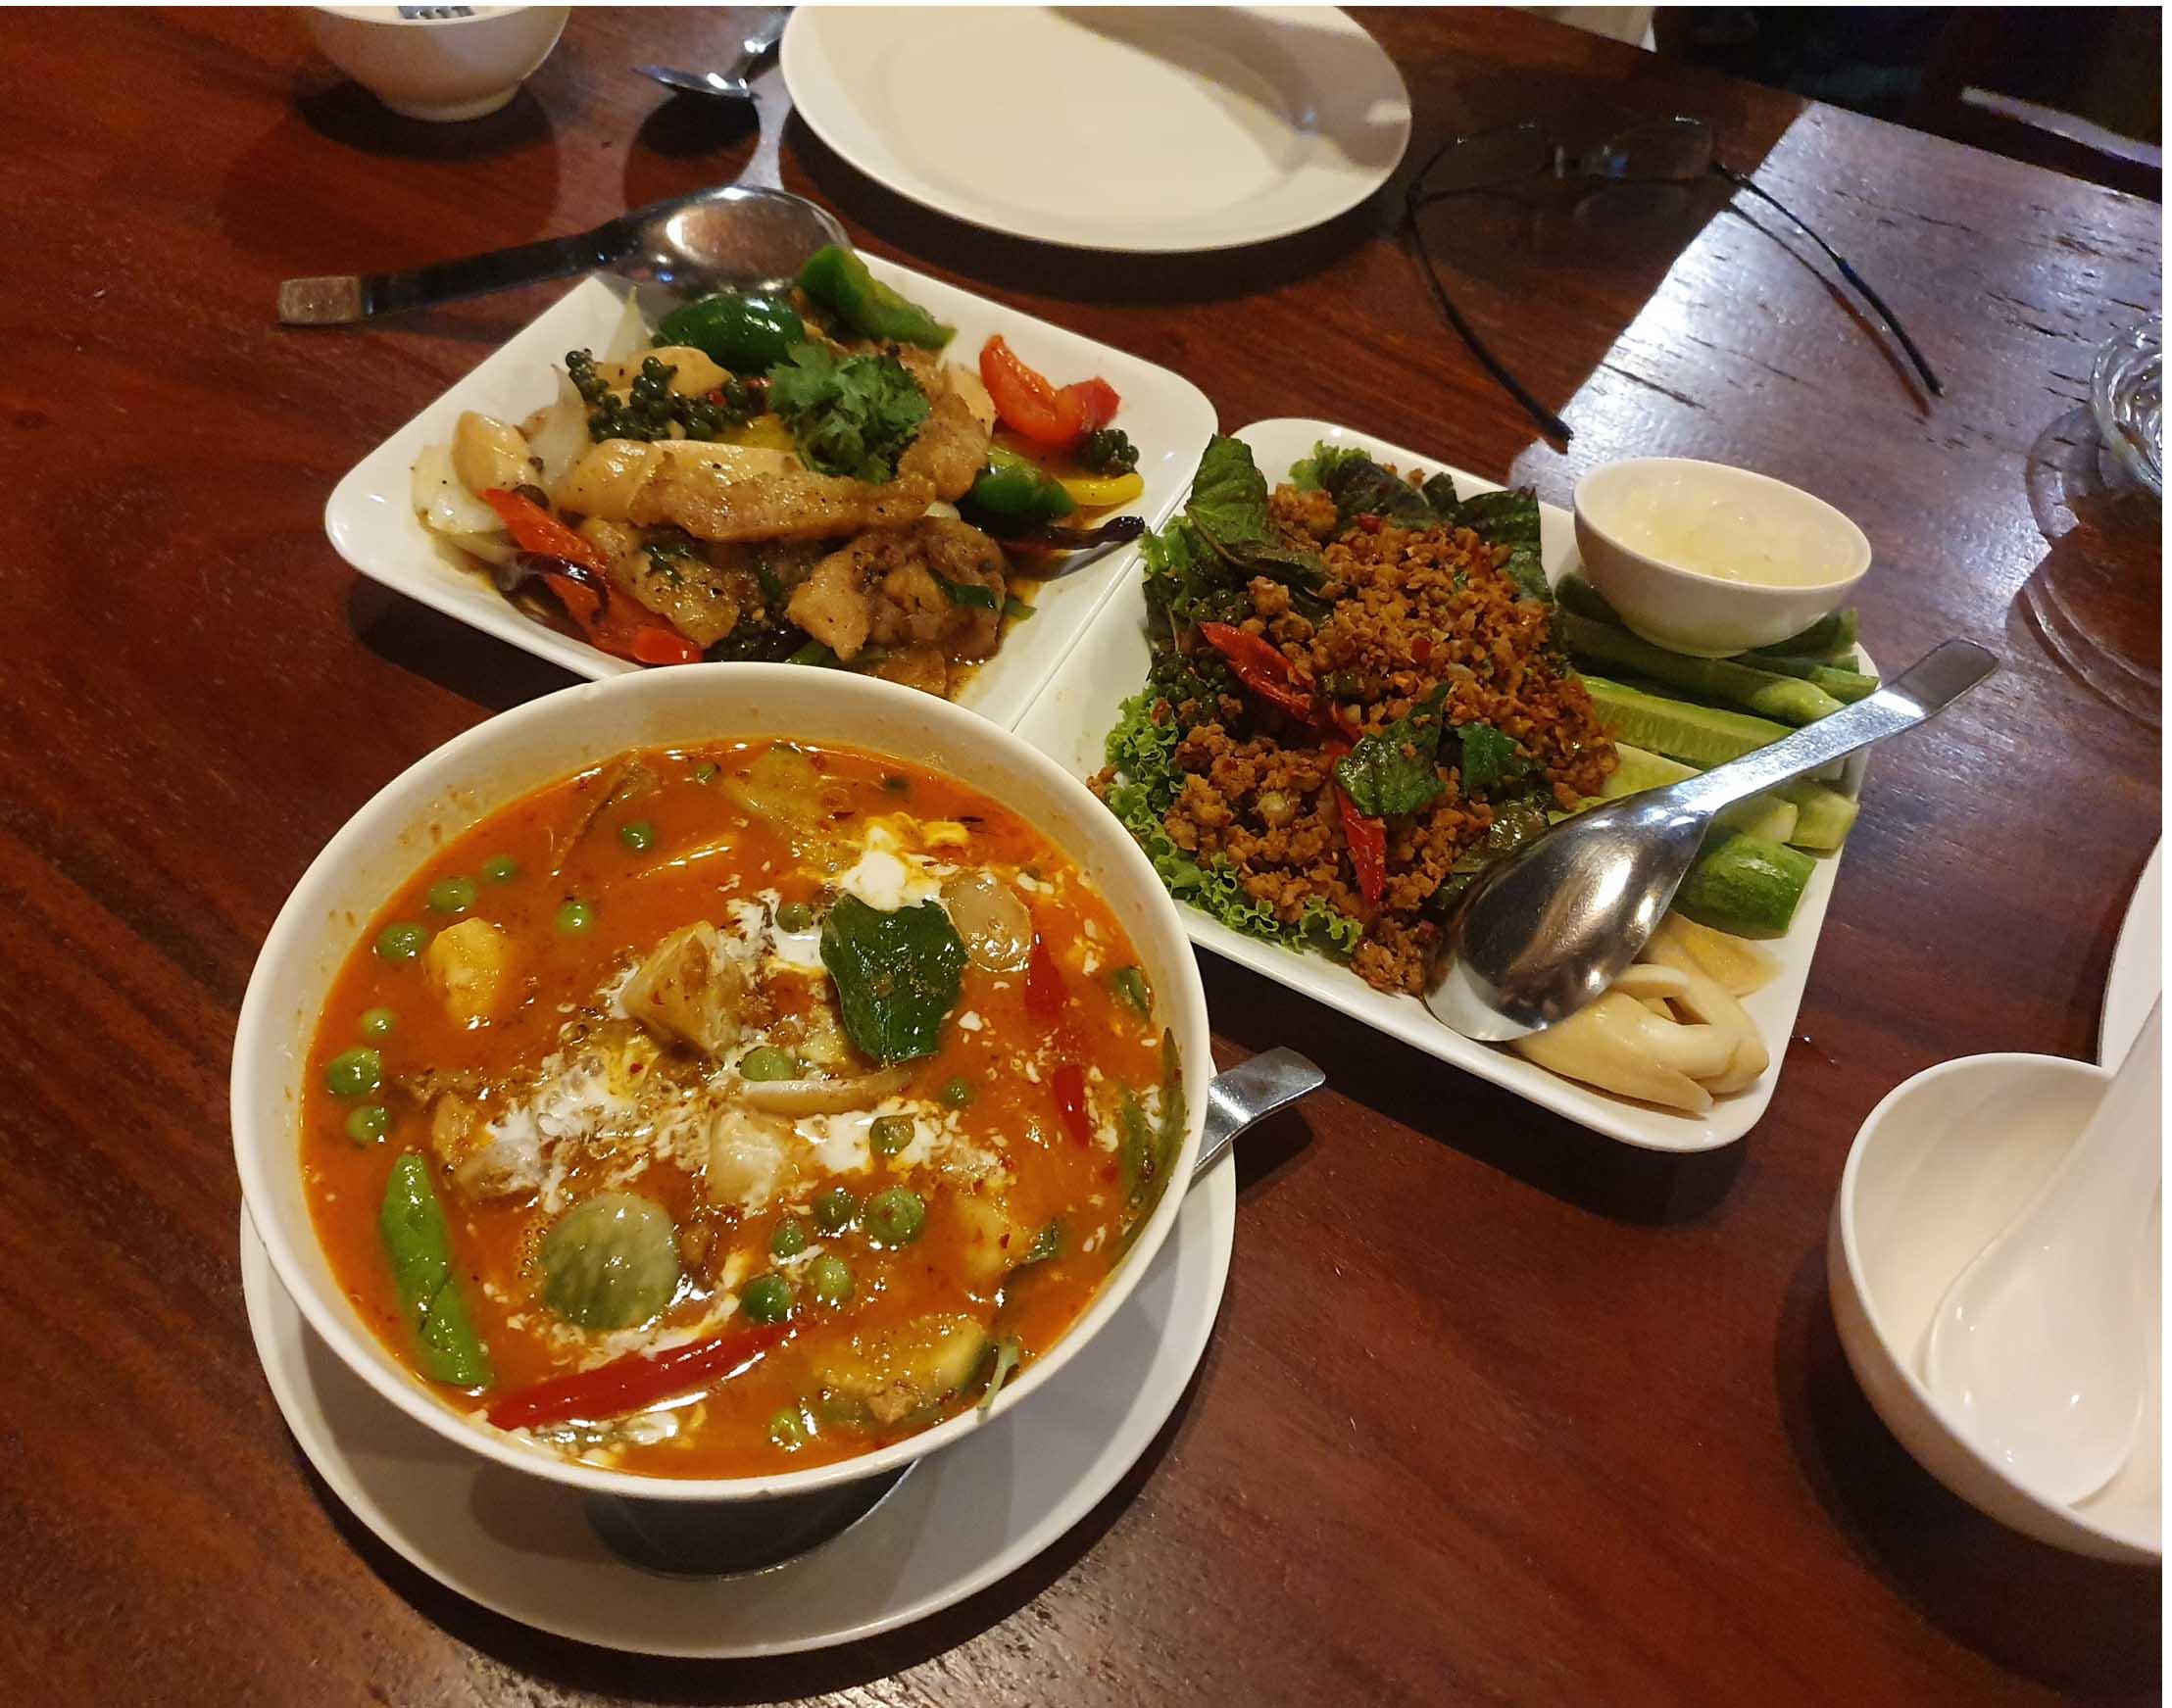 Our dinner at Kau Kampan restaurant